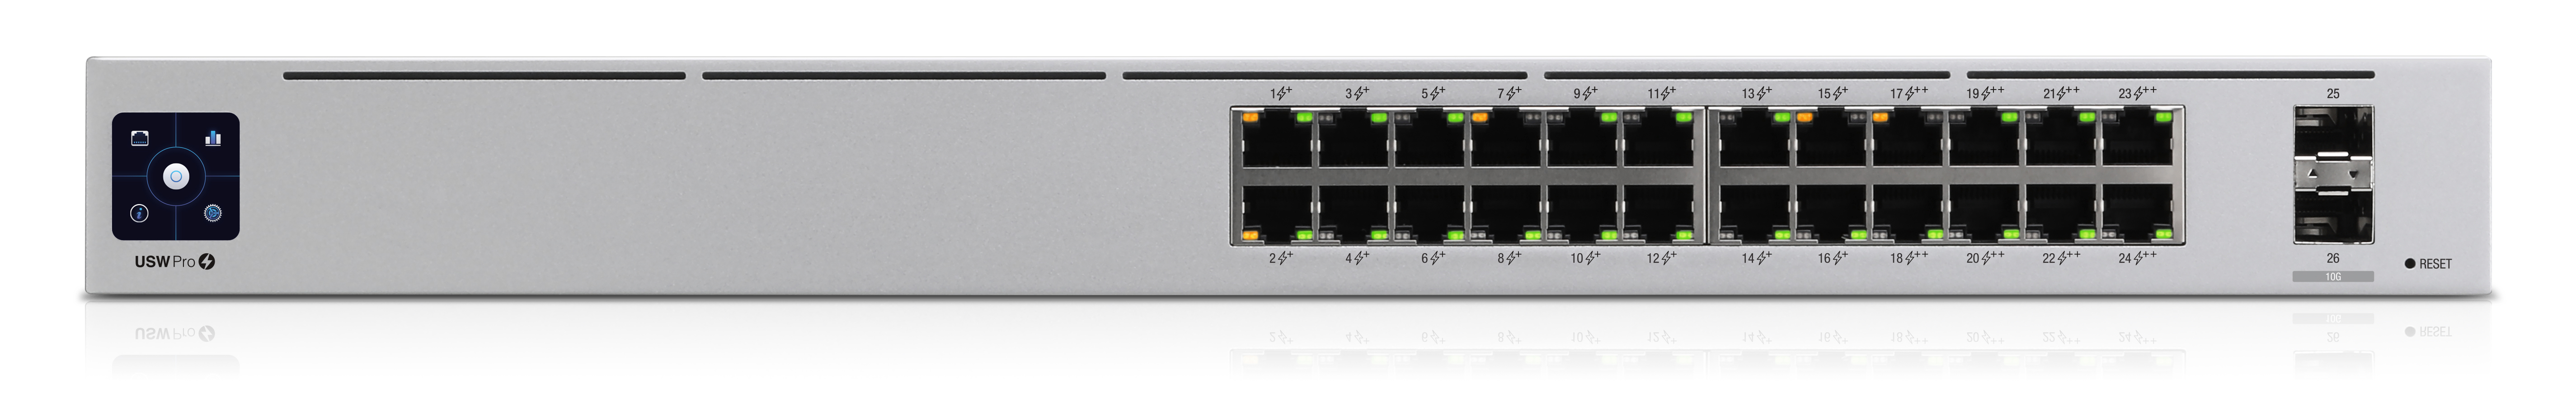 ubiquiti usw-pro-24-poe jetzt 25% billiger unifi 24port gigabit switch with  802.3bt poe,  senetic